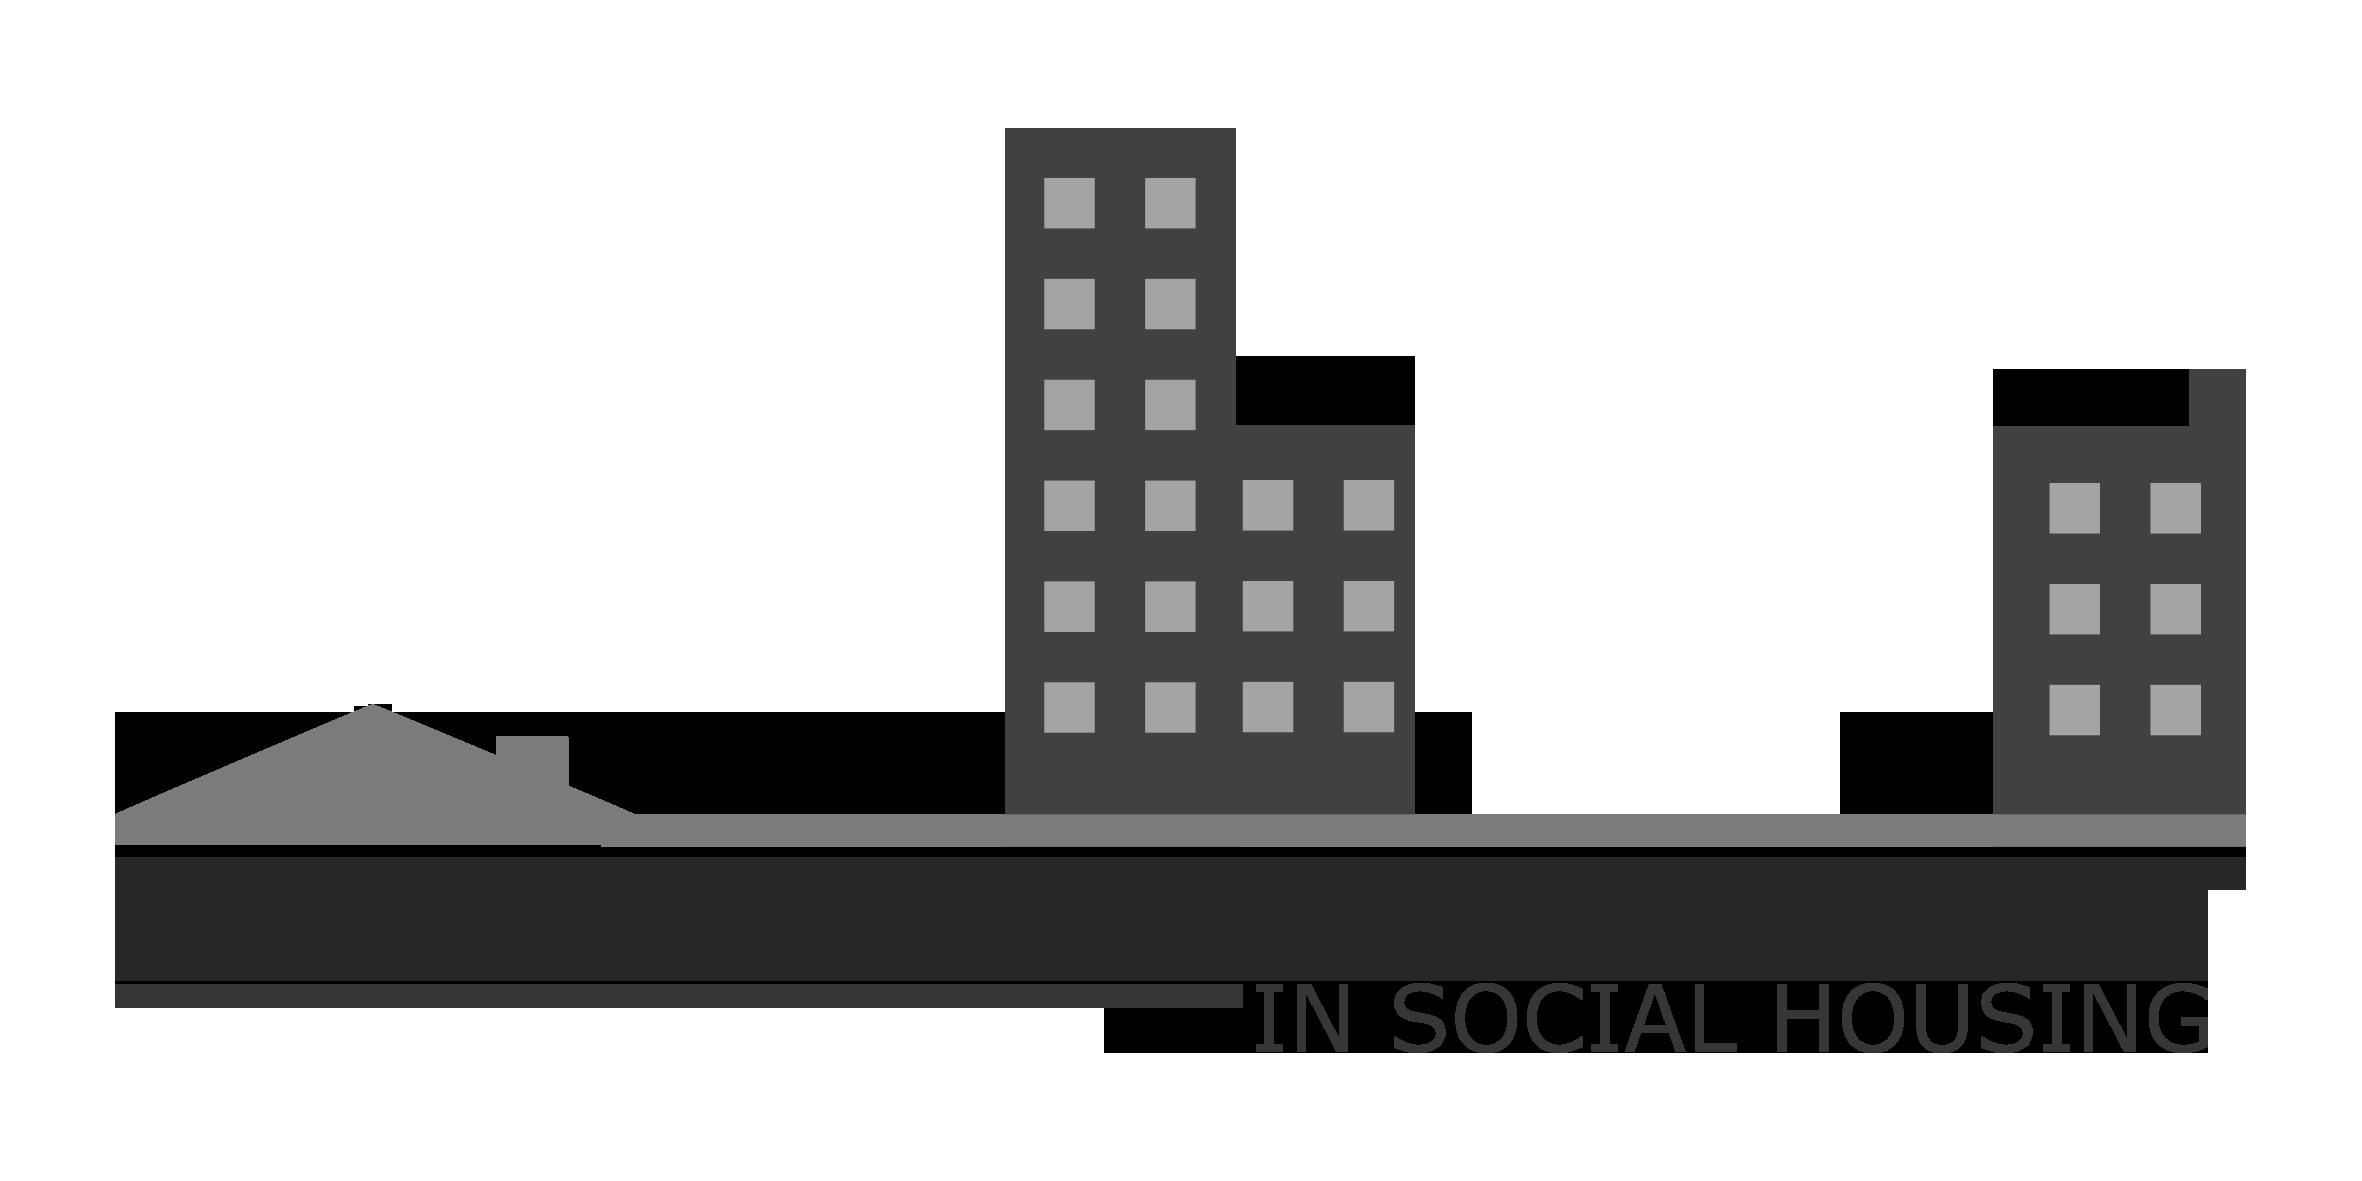 IEQ_in_social_housing